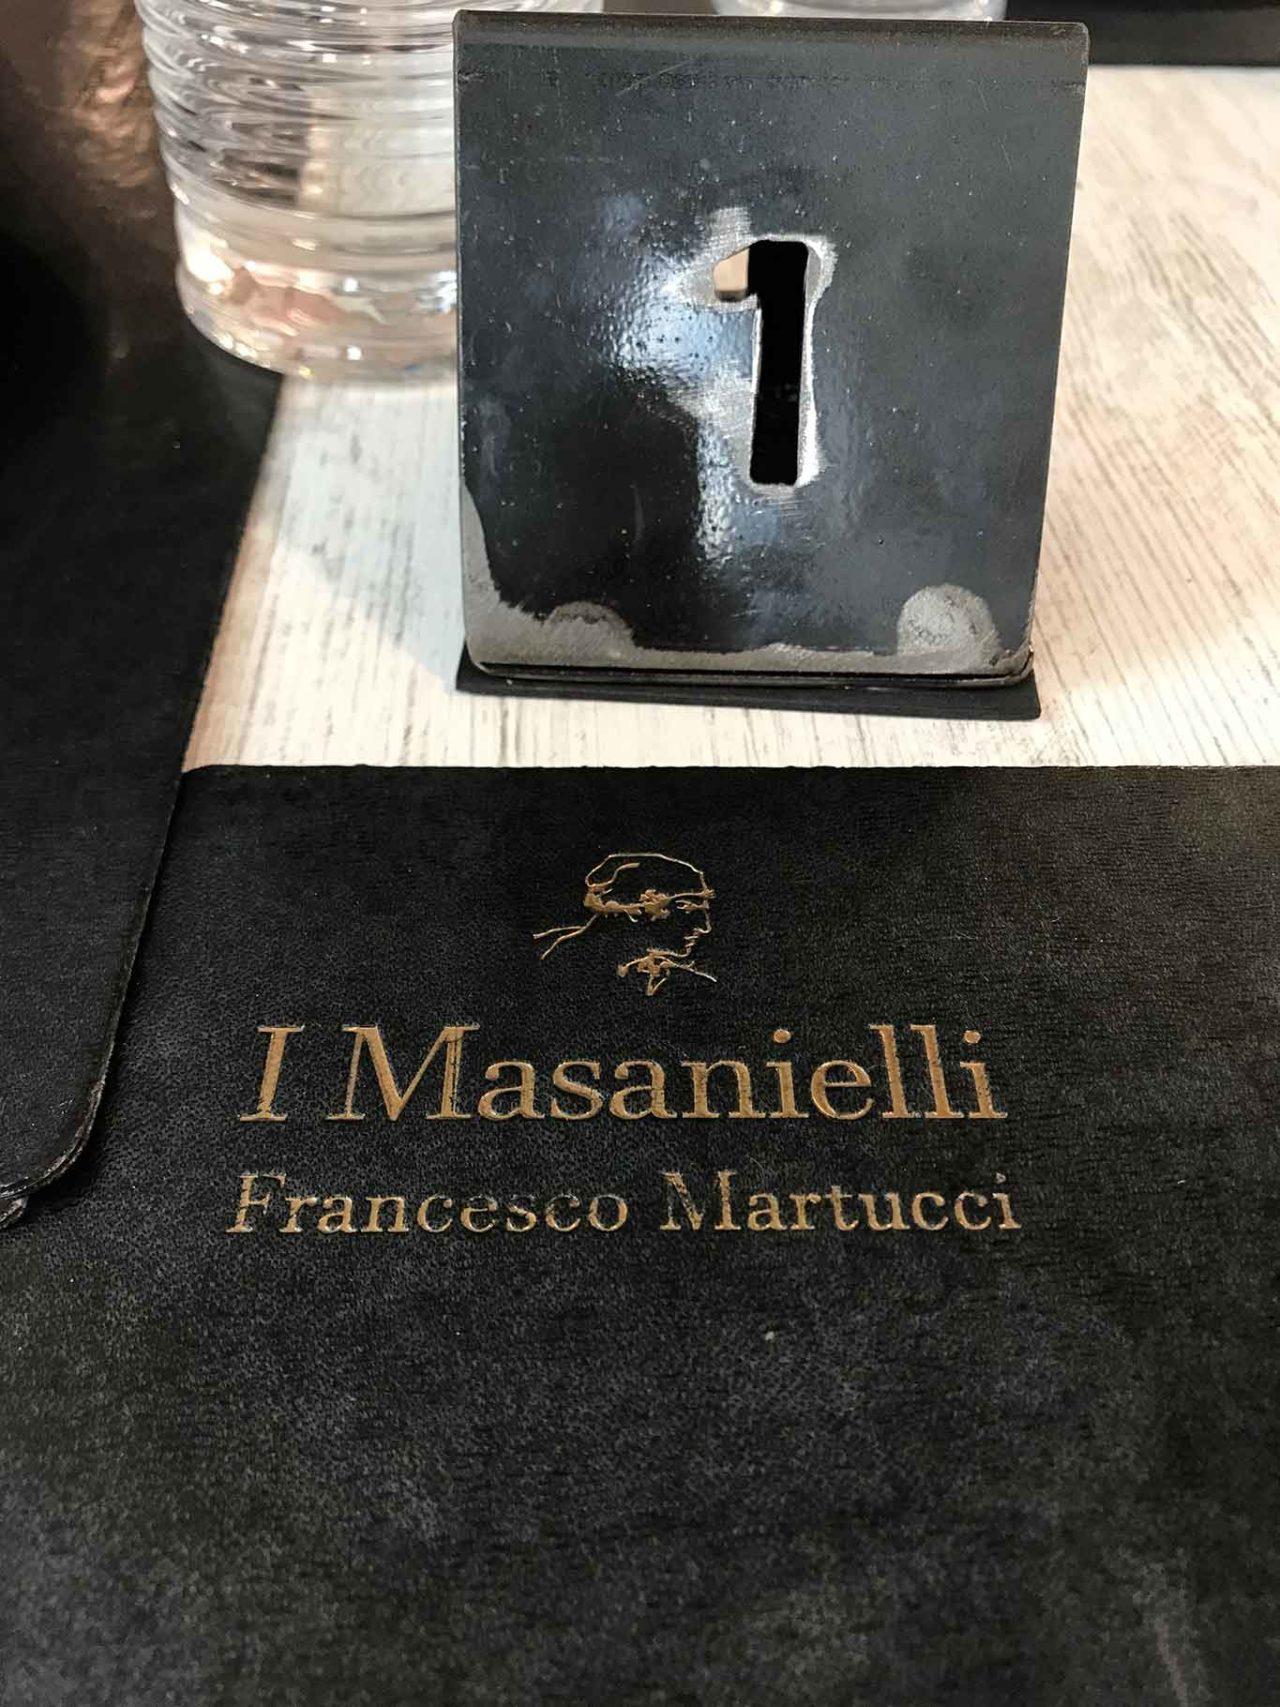 tavolo pizzeria I Masanielli